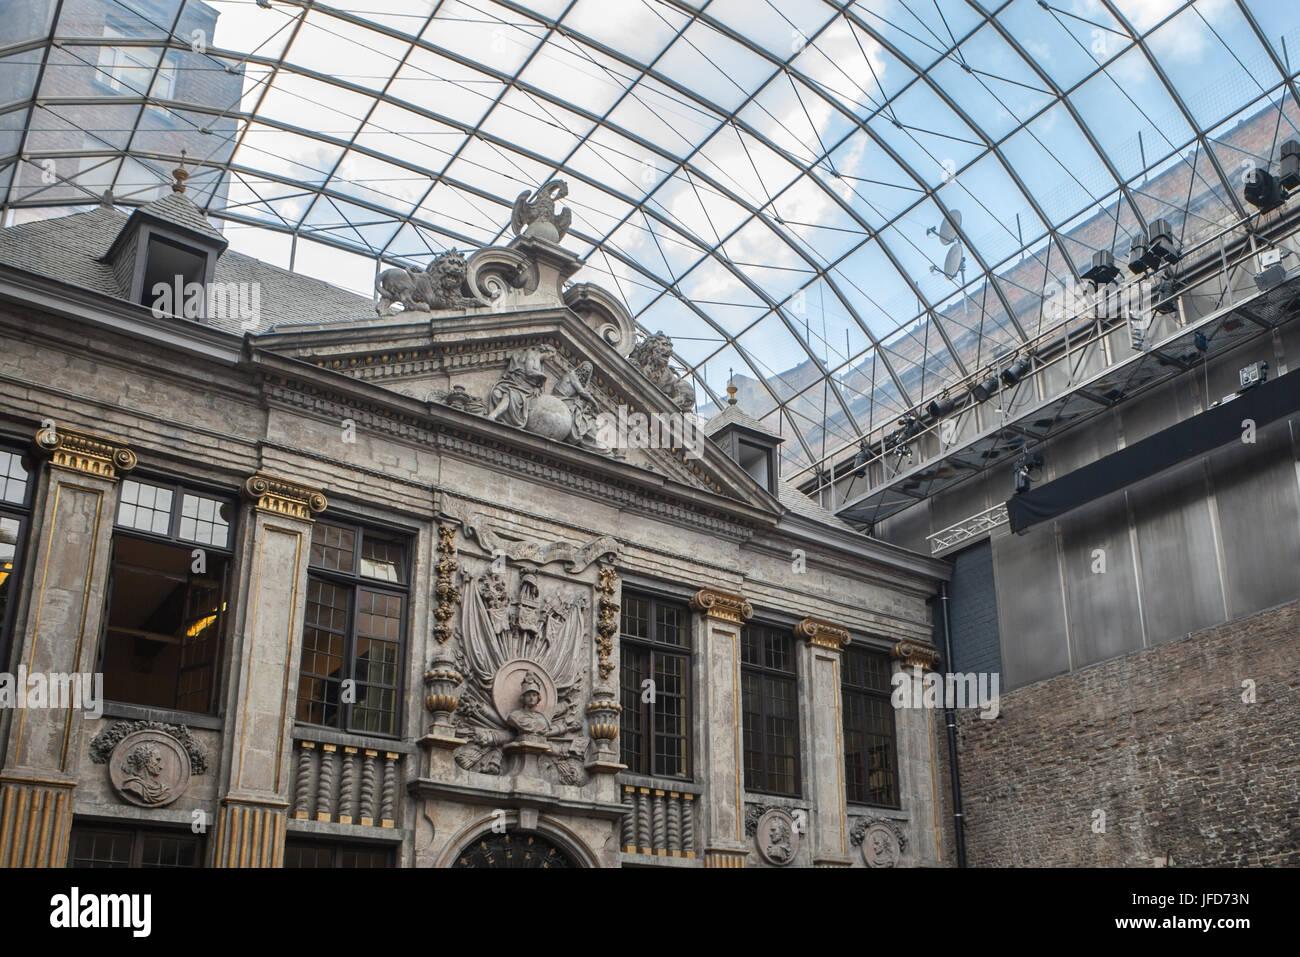 The Galeries Royales Saint-Hubert - Stock Image